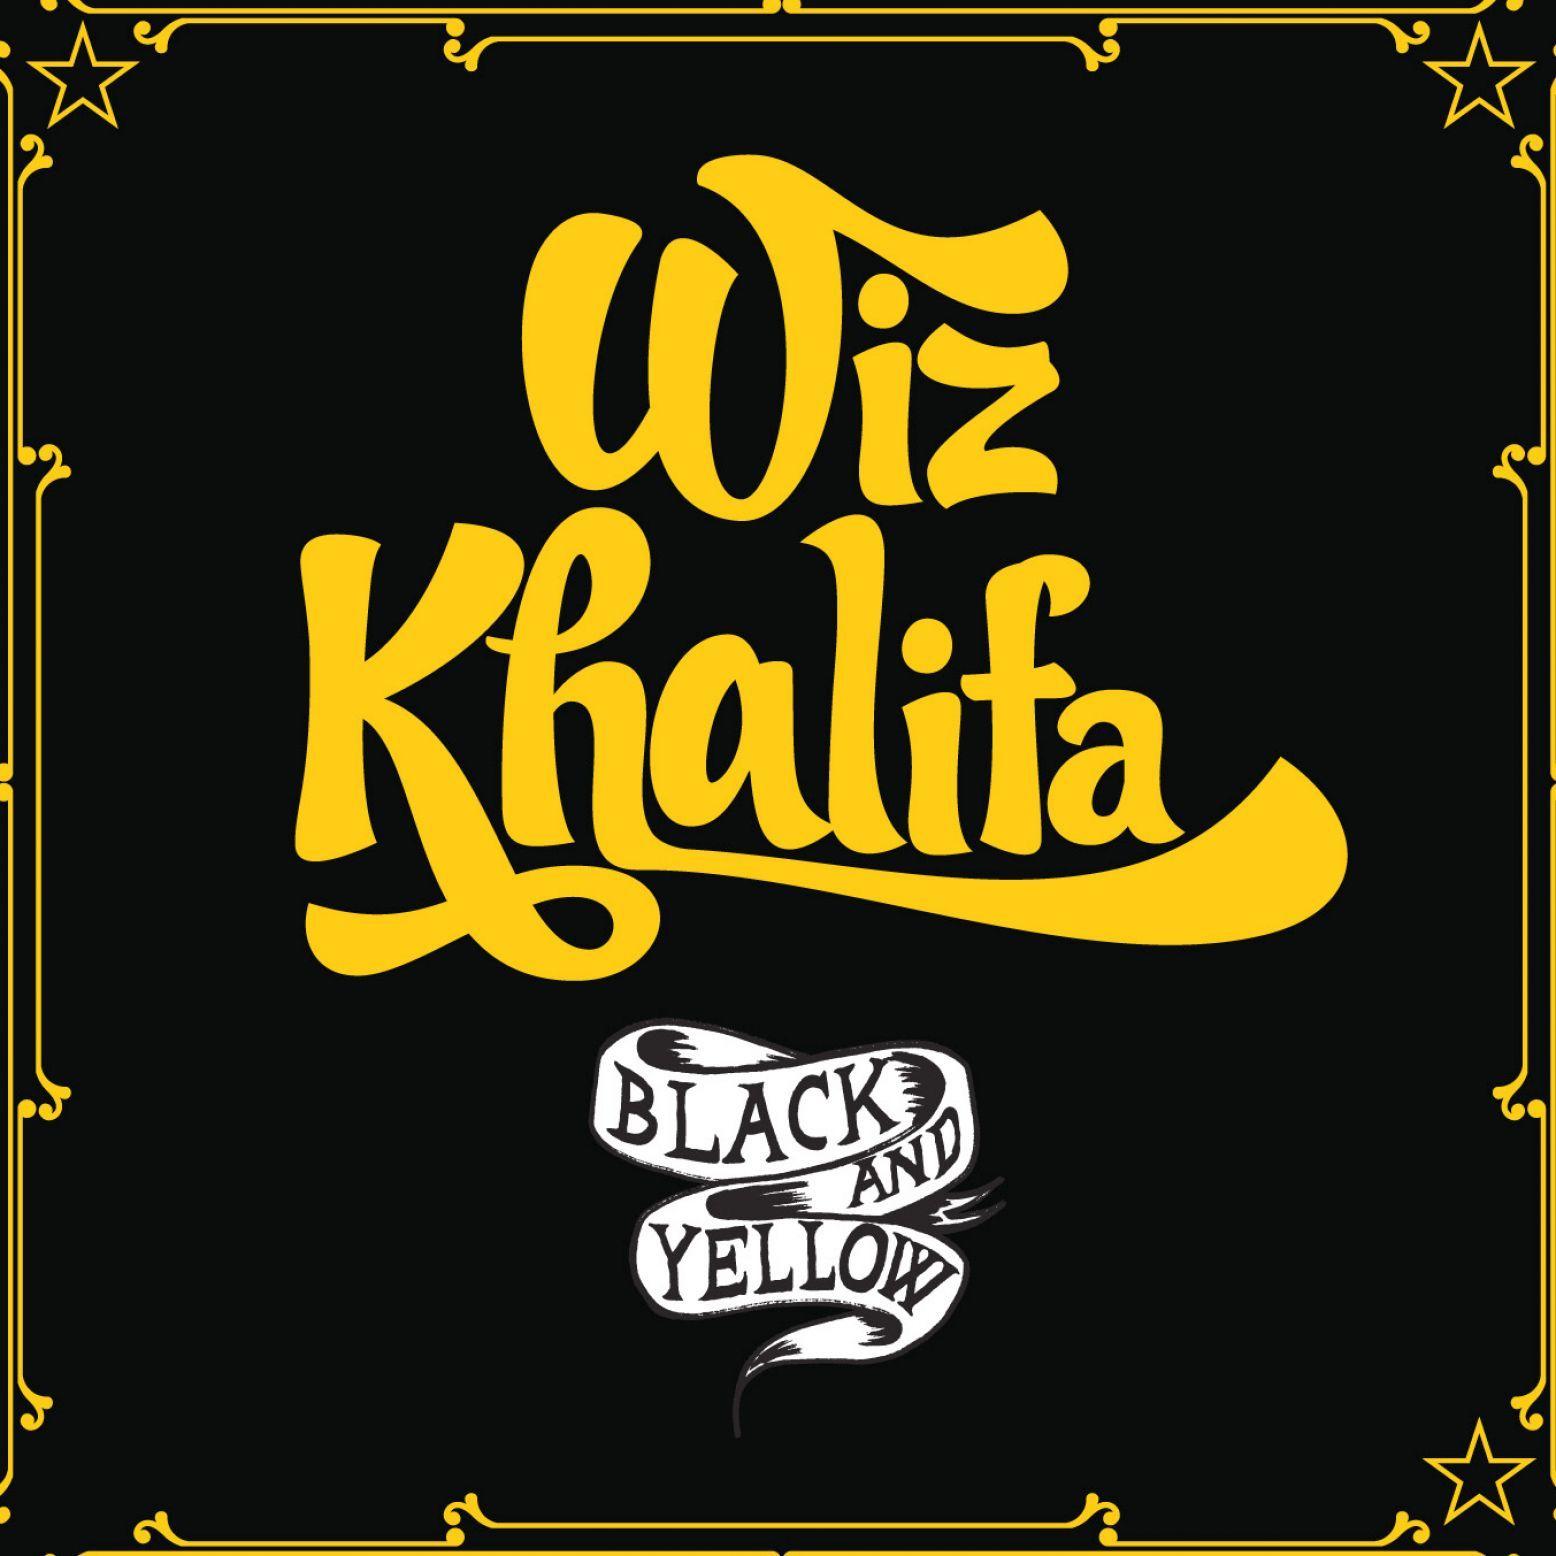 43073-black-and-yellow-wiz-khalifa-album-cover_4